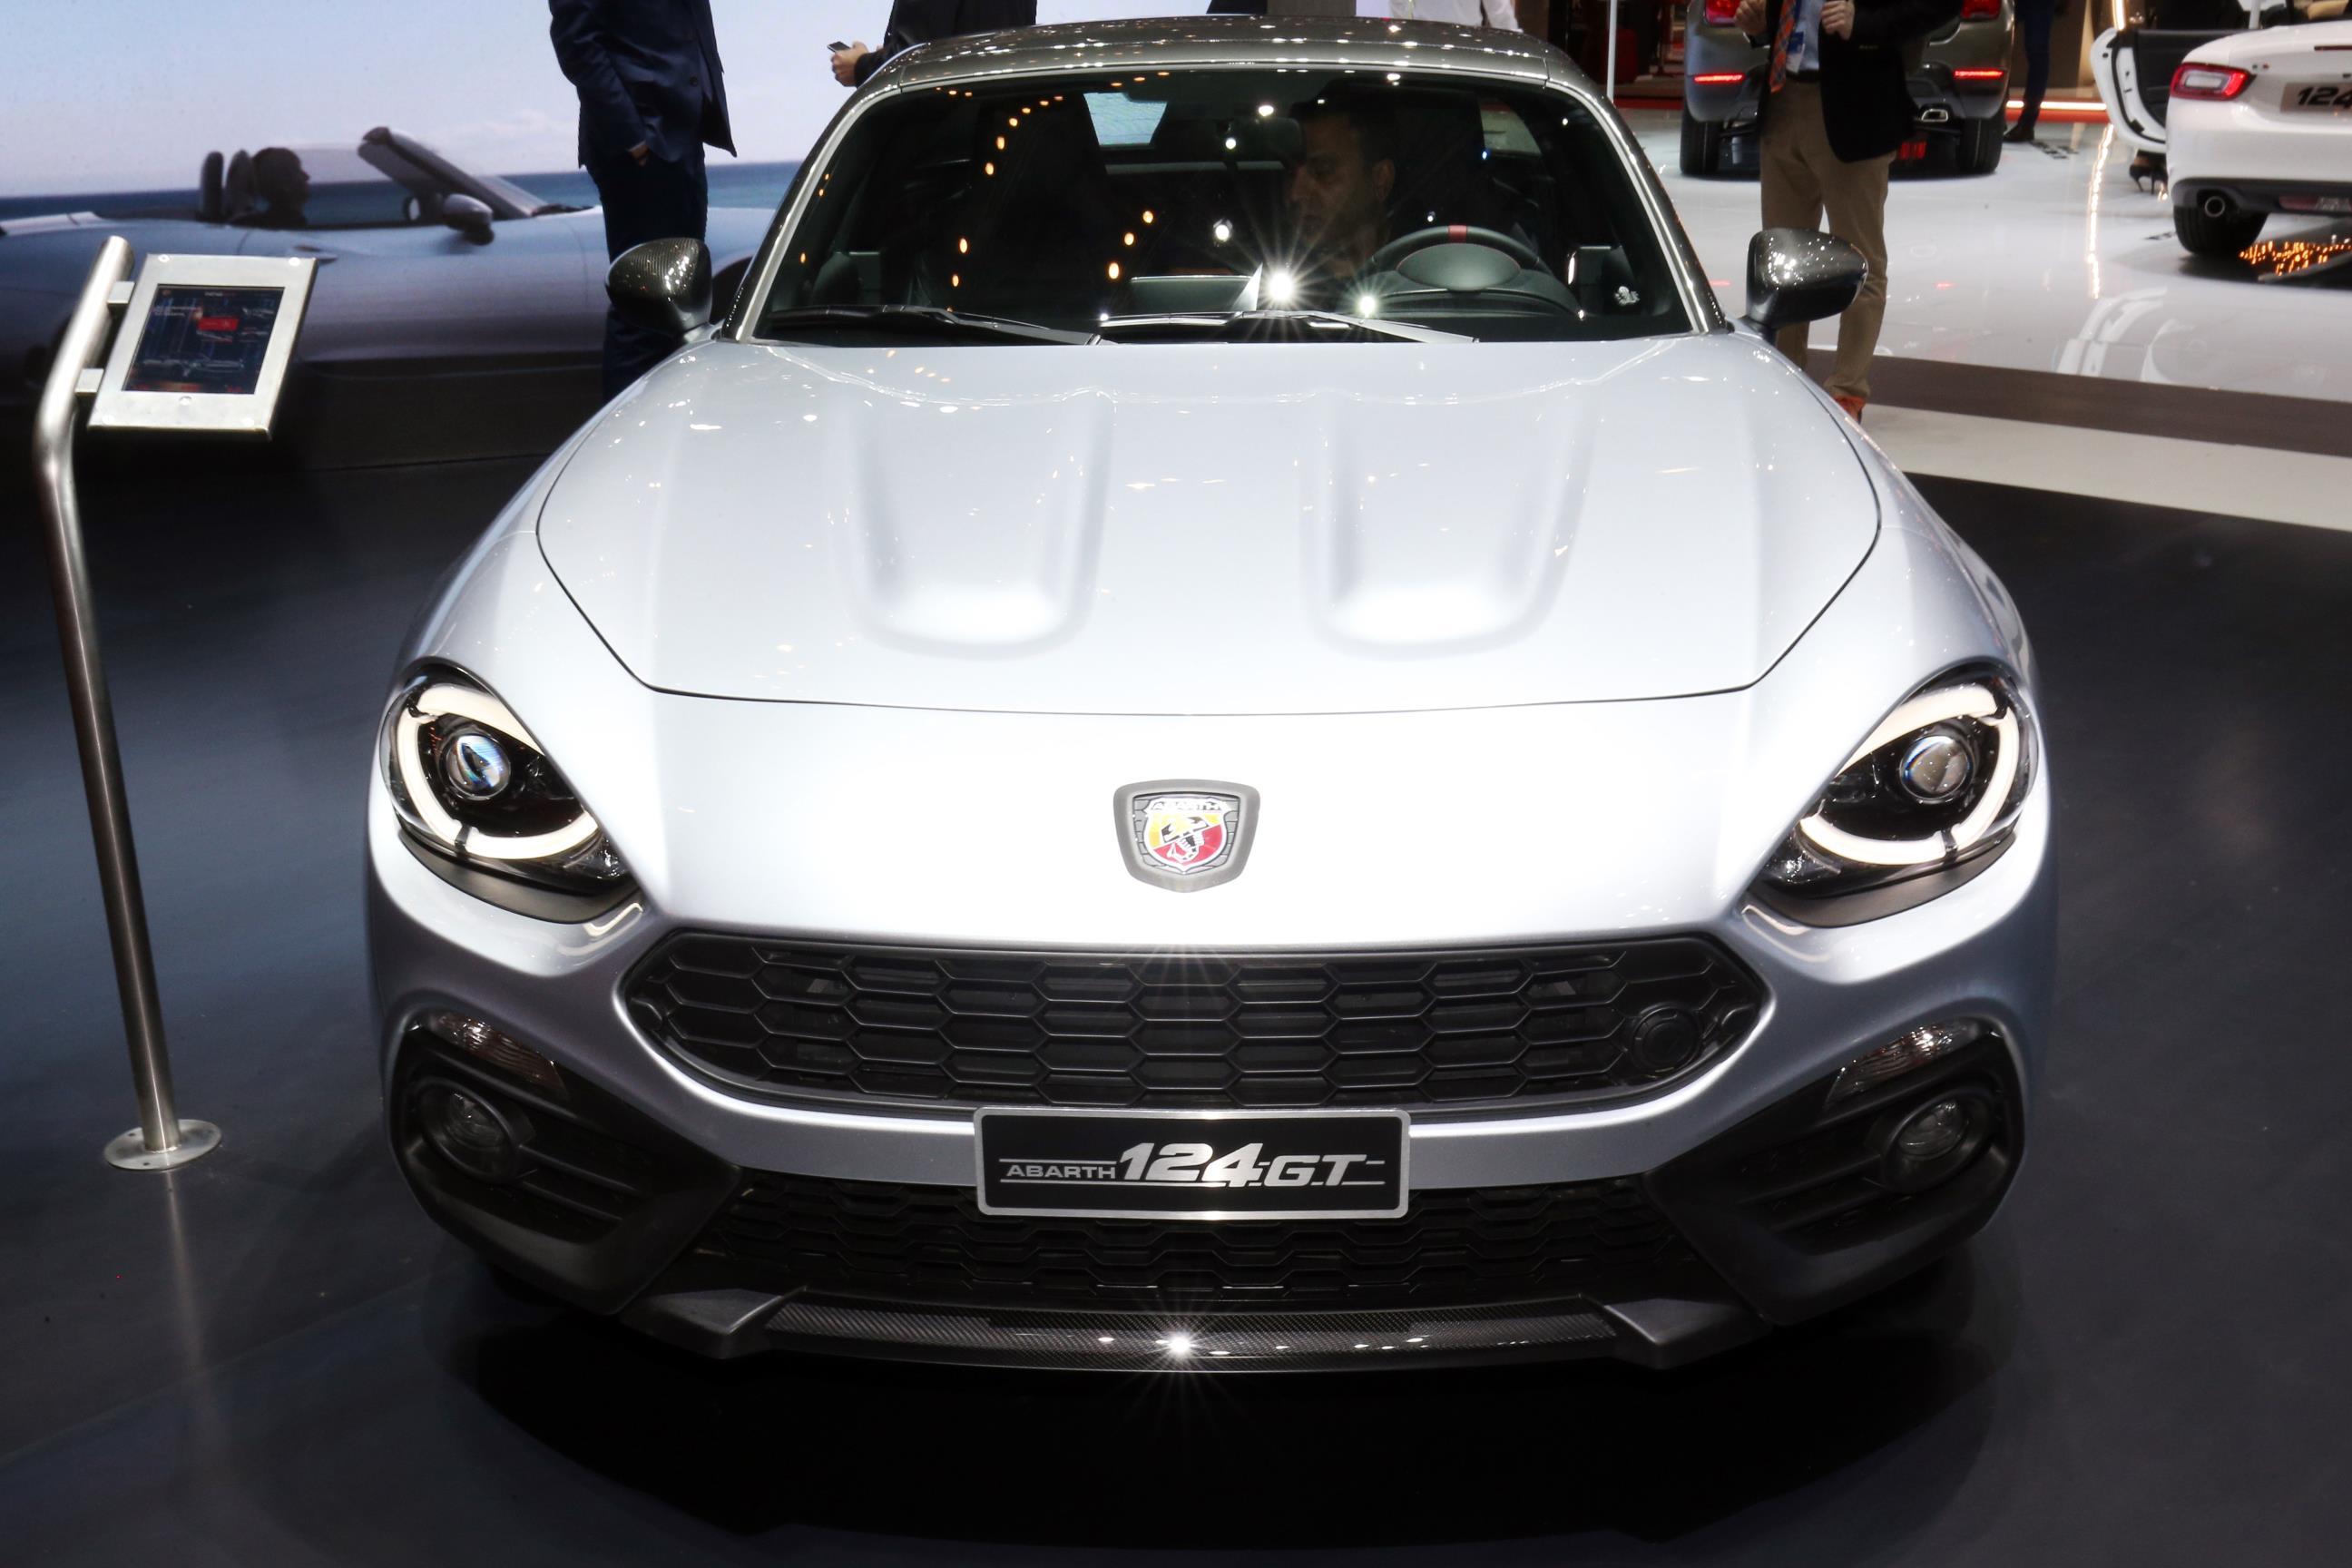 Geneva Motor Show 2018 Mega Gallery Part 1 (376)